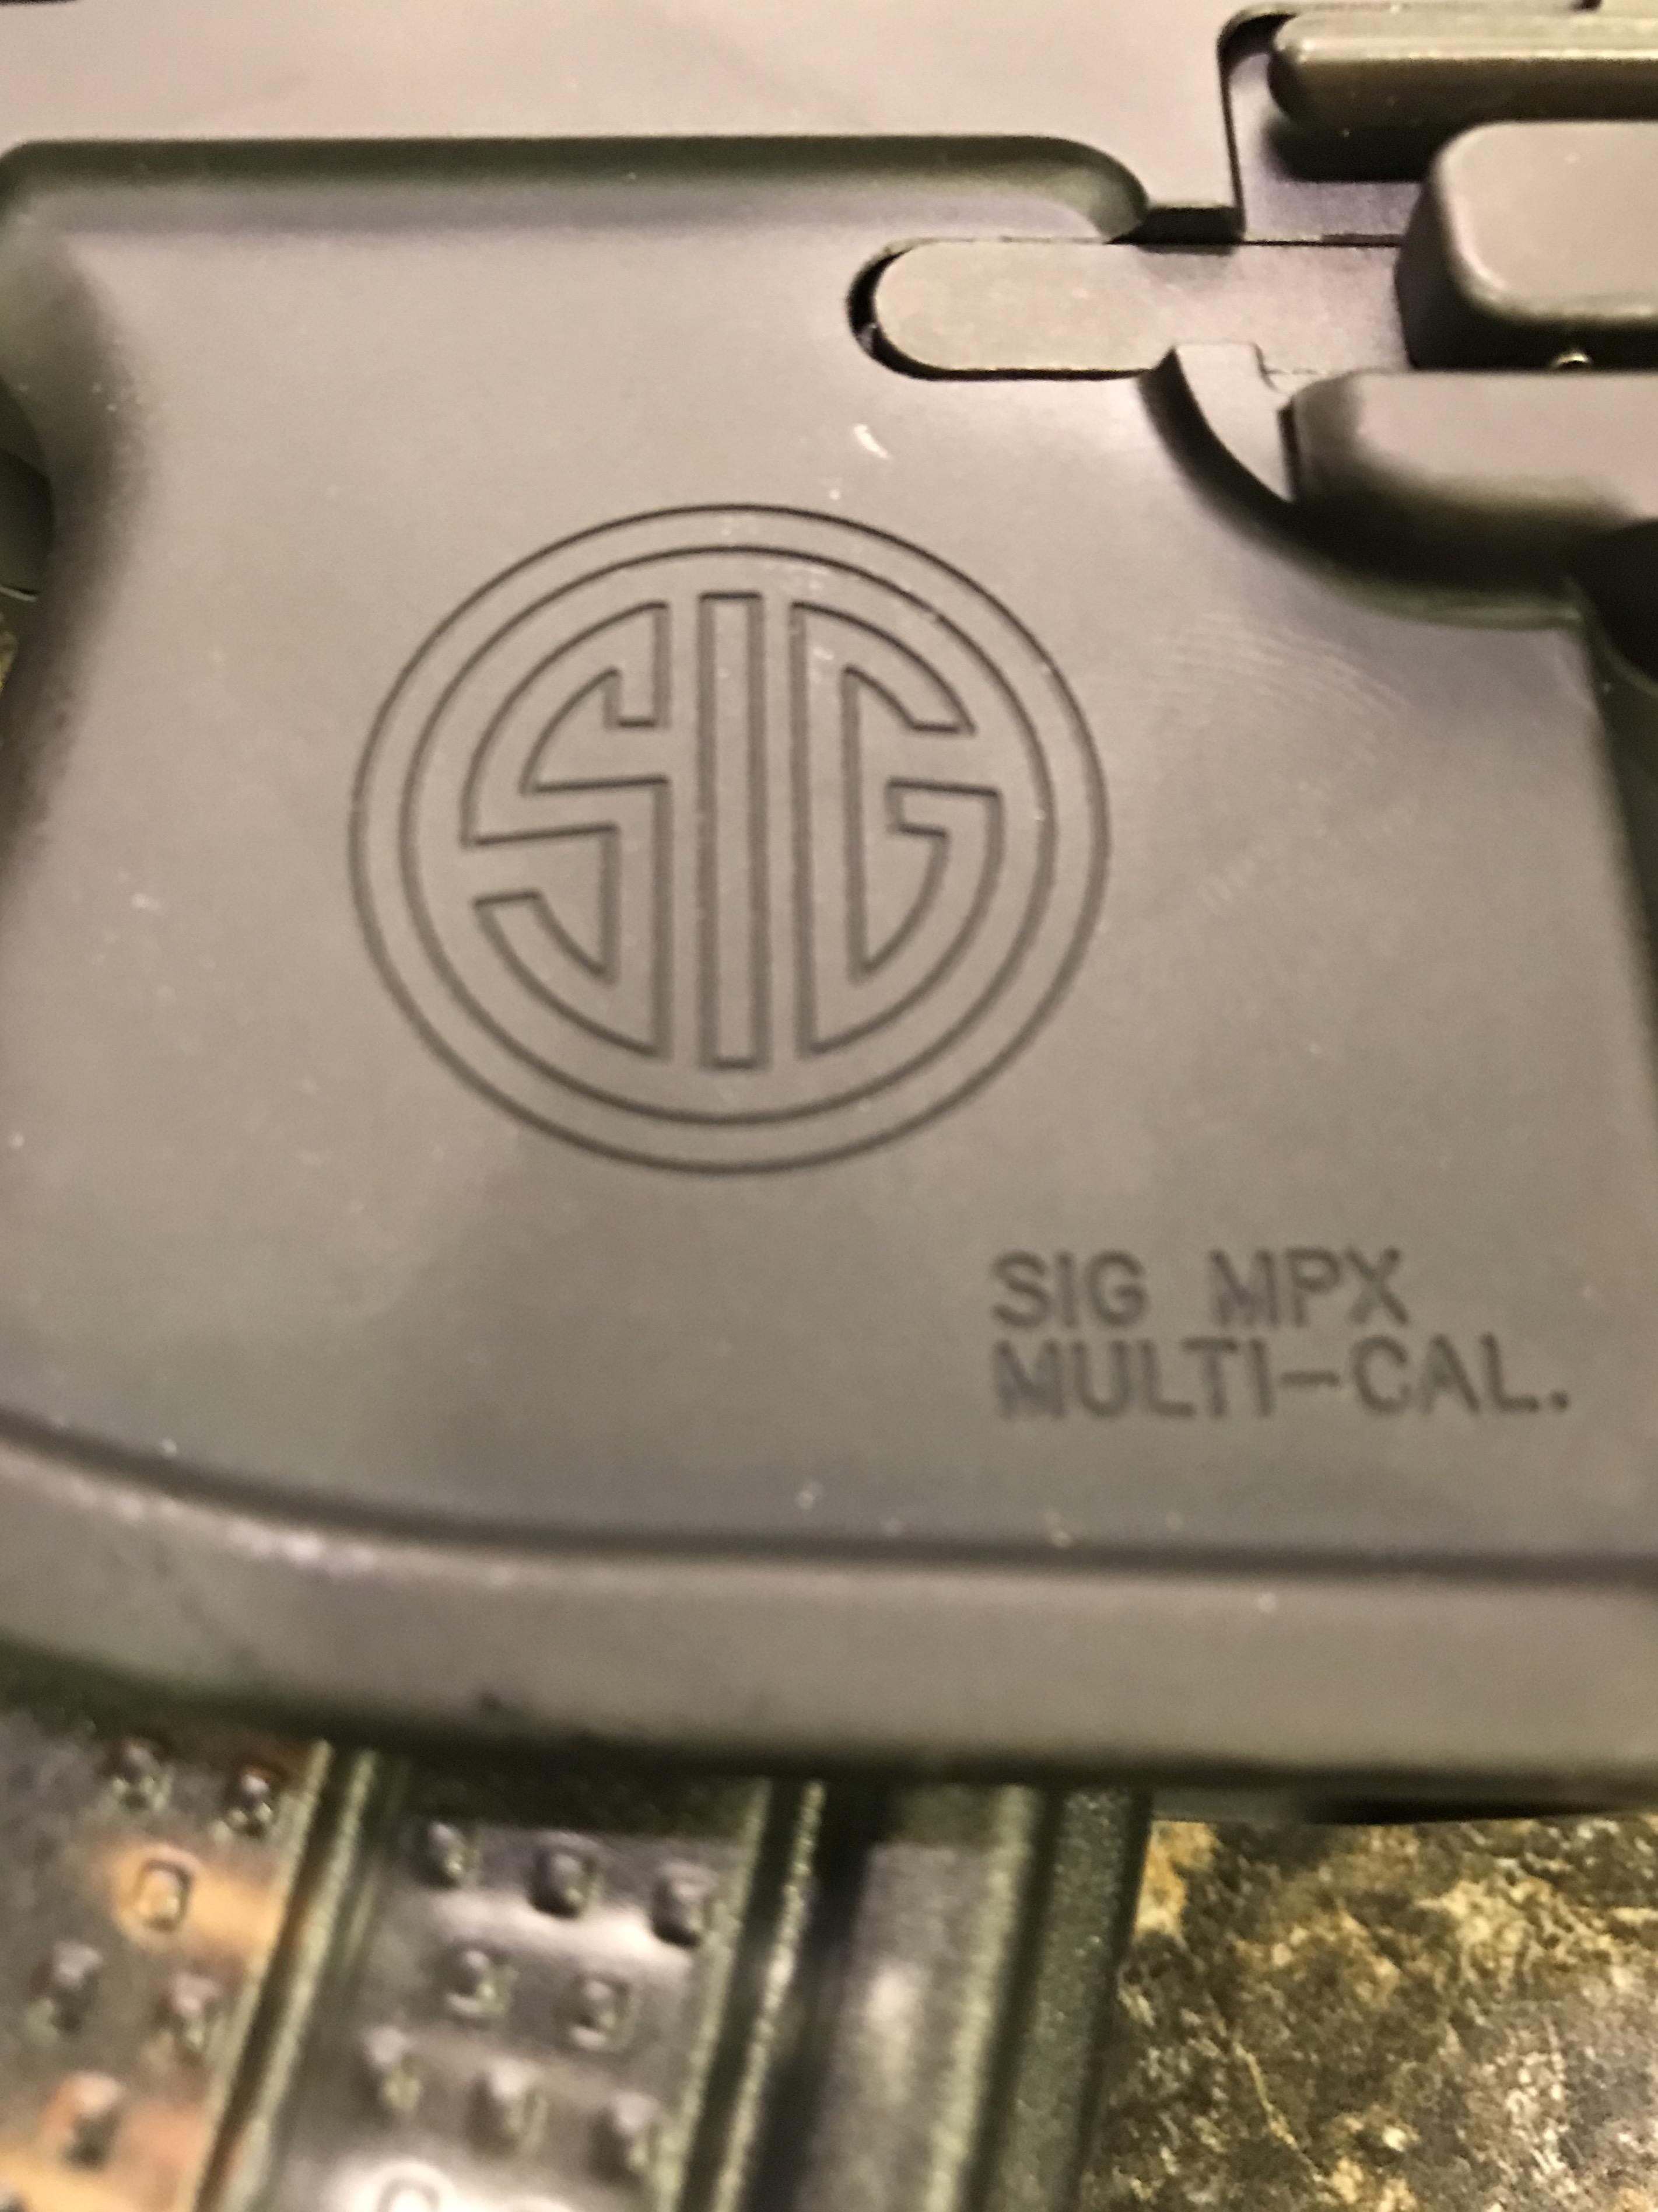 WTS:  SIG MPX-K 9mm Pistol-dca9b664-8eac-4e7c-a096-e707506536b1.jpeg